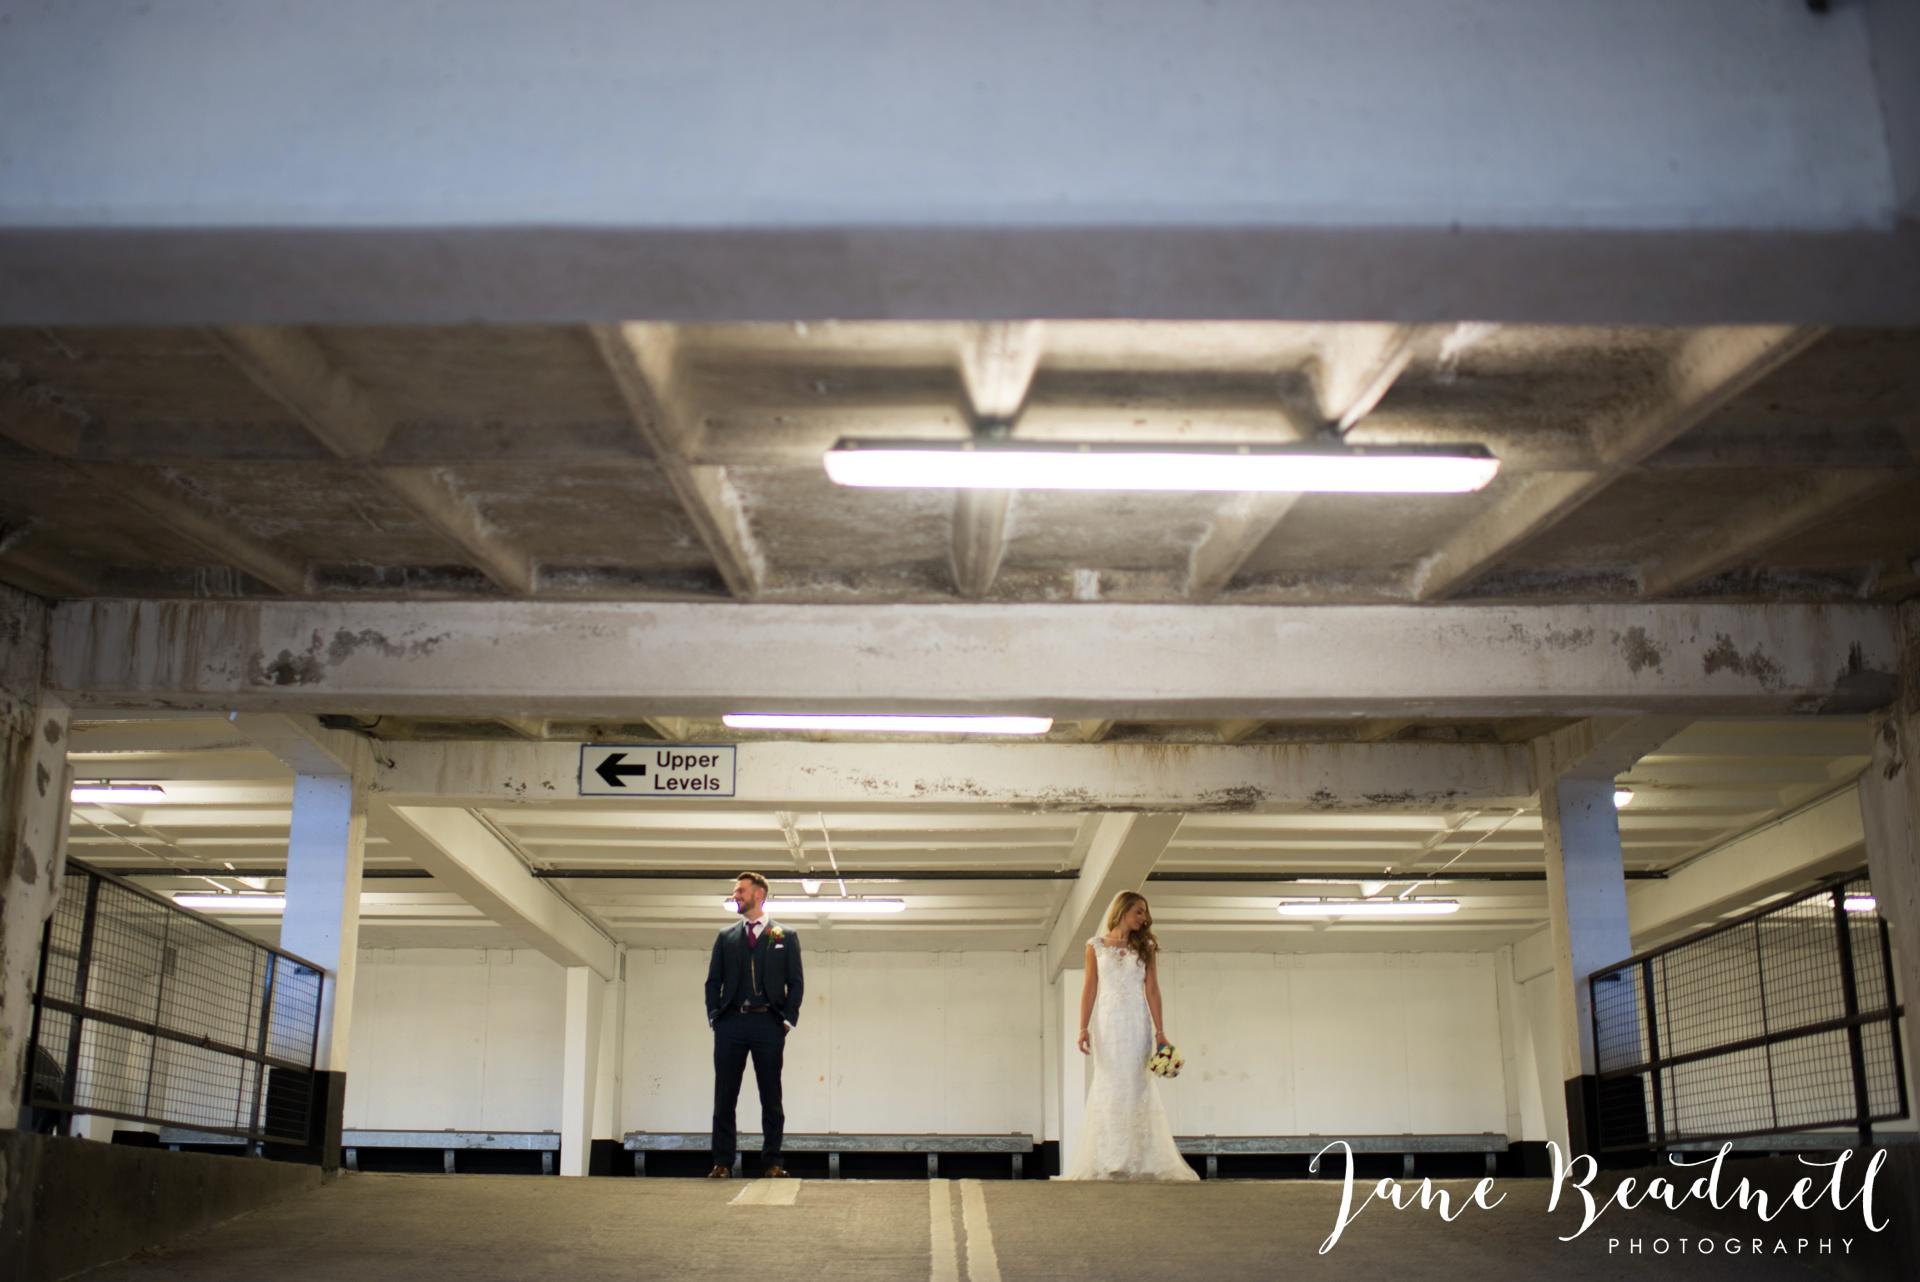 Jane Beadnell fine art wedding photographer Harrogate_0004